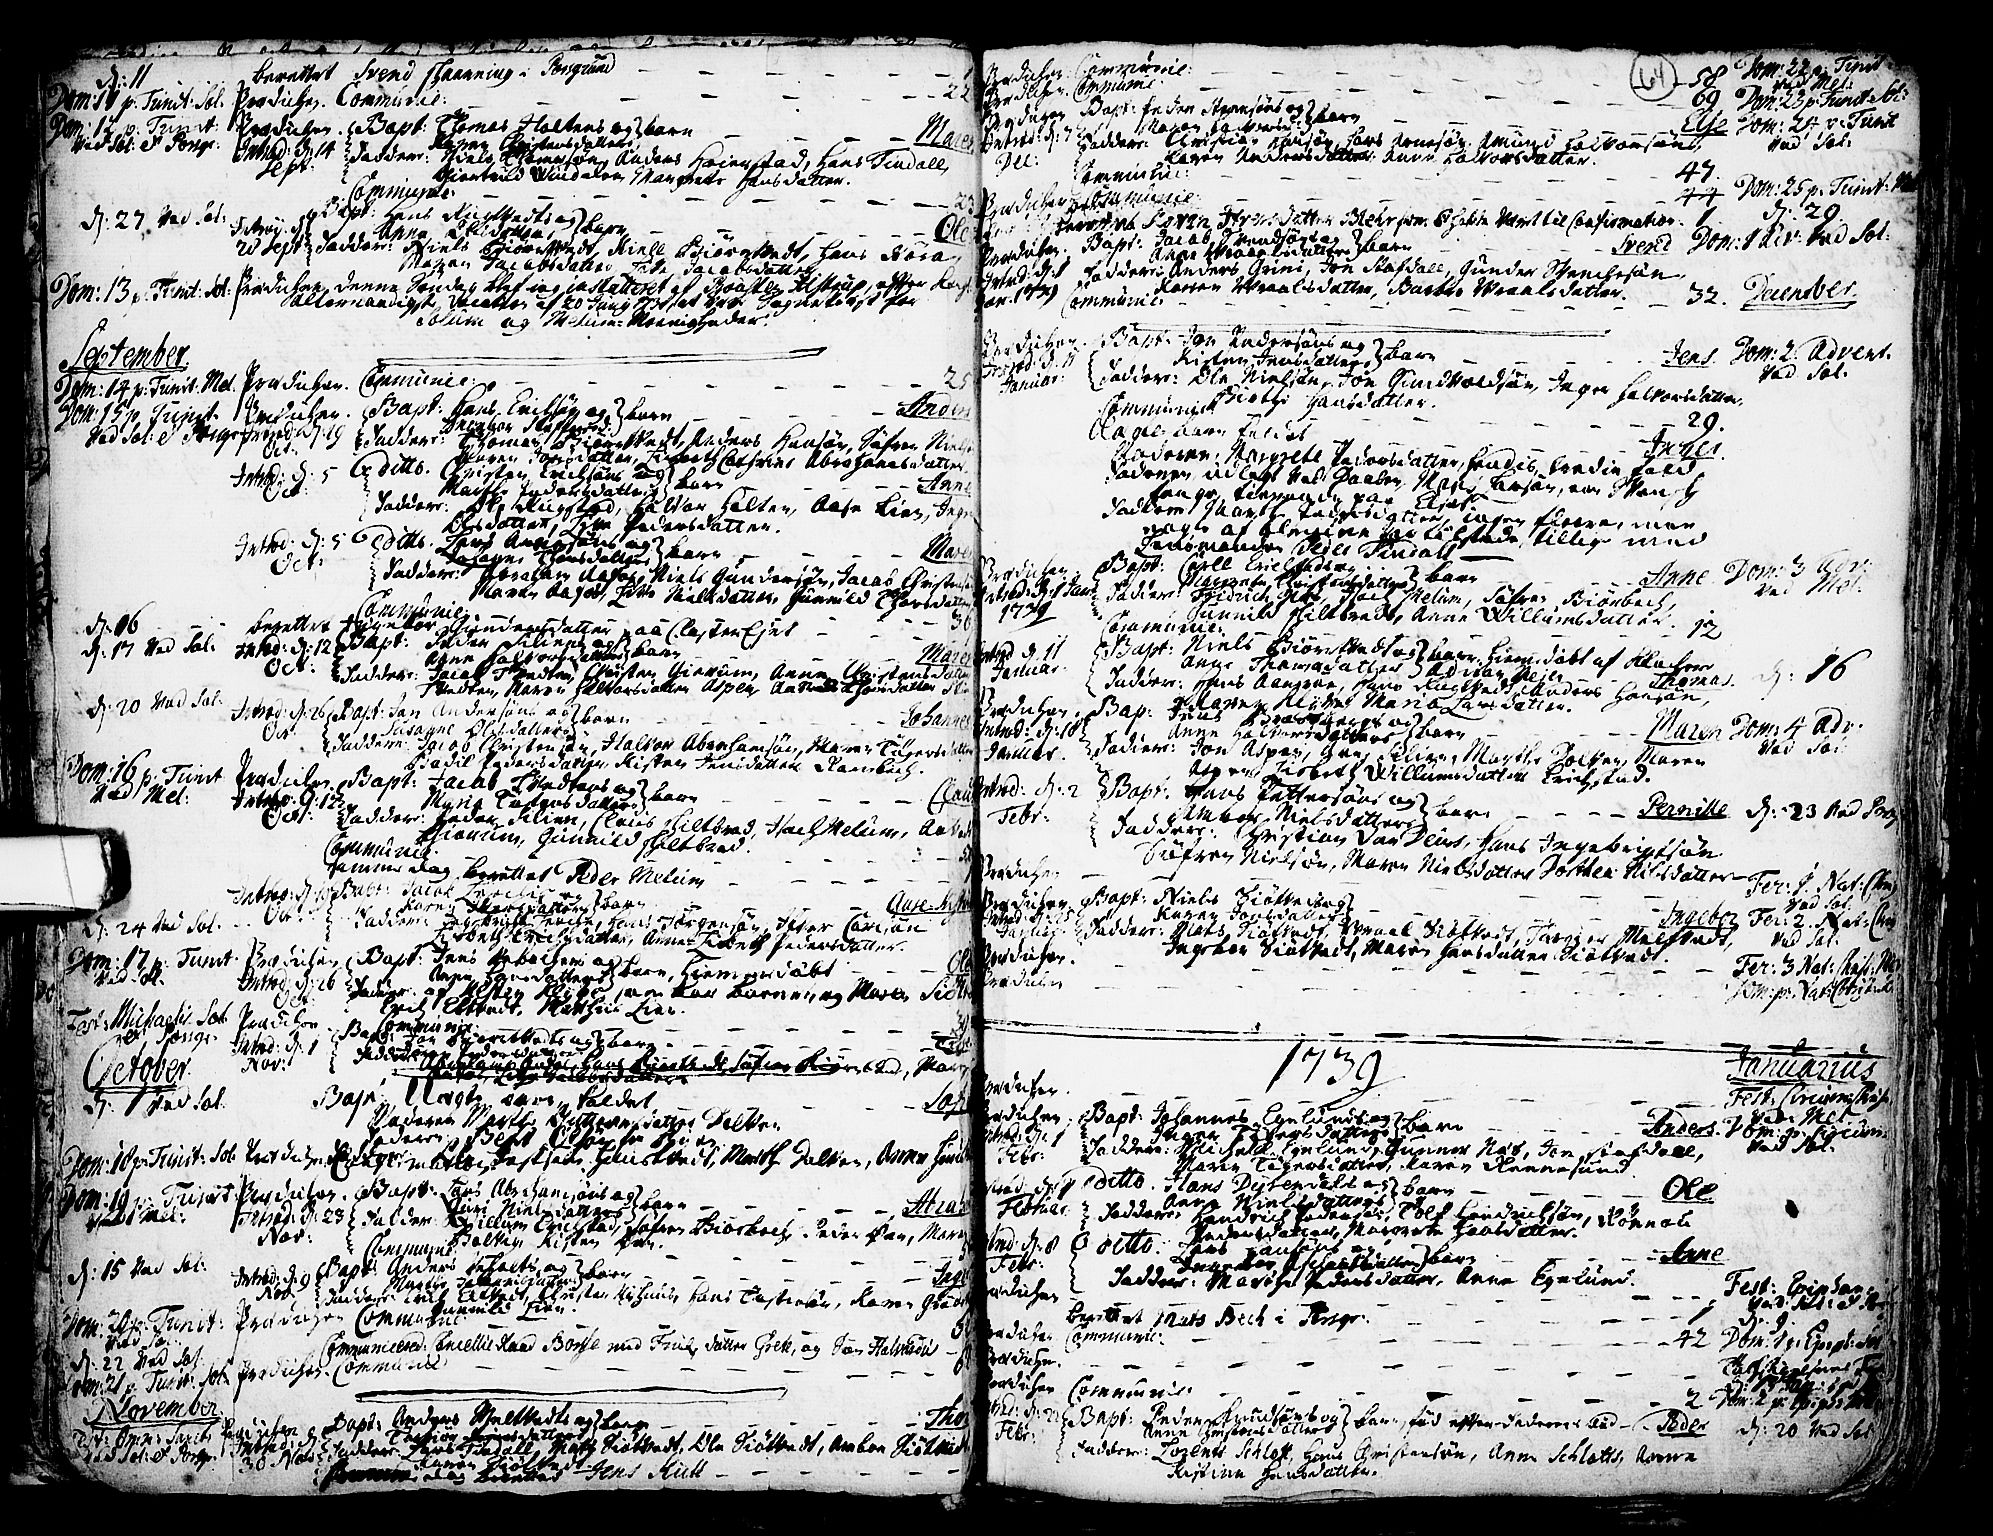 SAKO, Solum kirkebøker, F/Fa/L0002: Ministerialbok nr. I 2, 1713-1761, s. 64